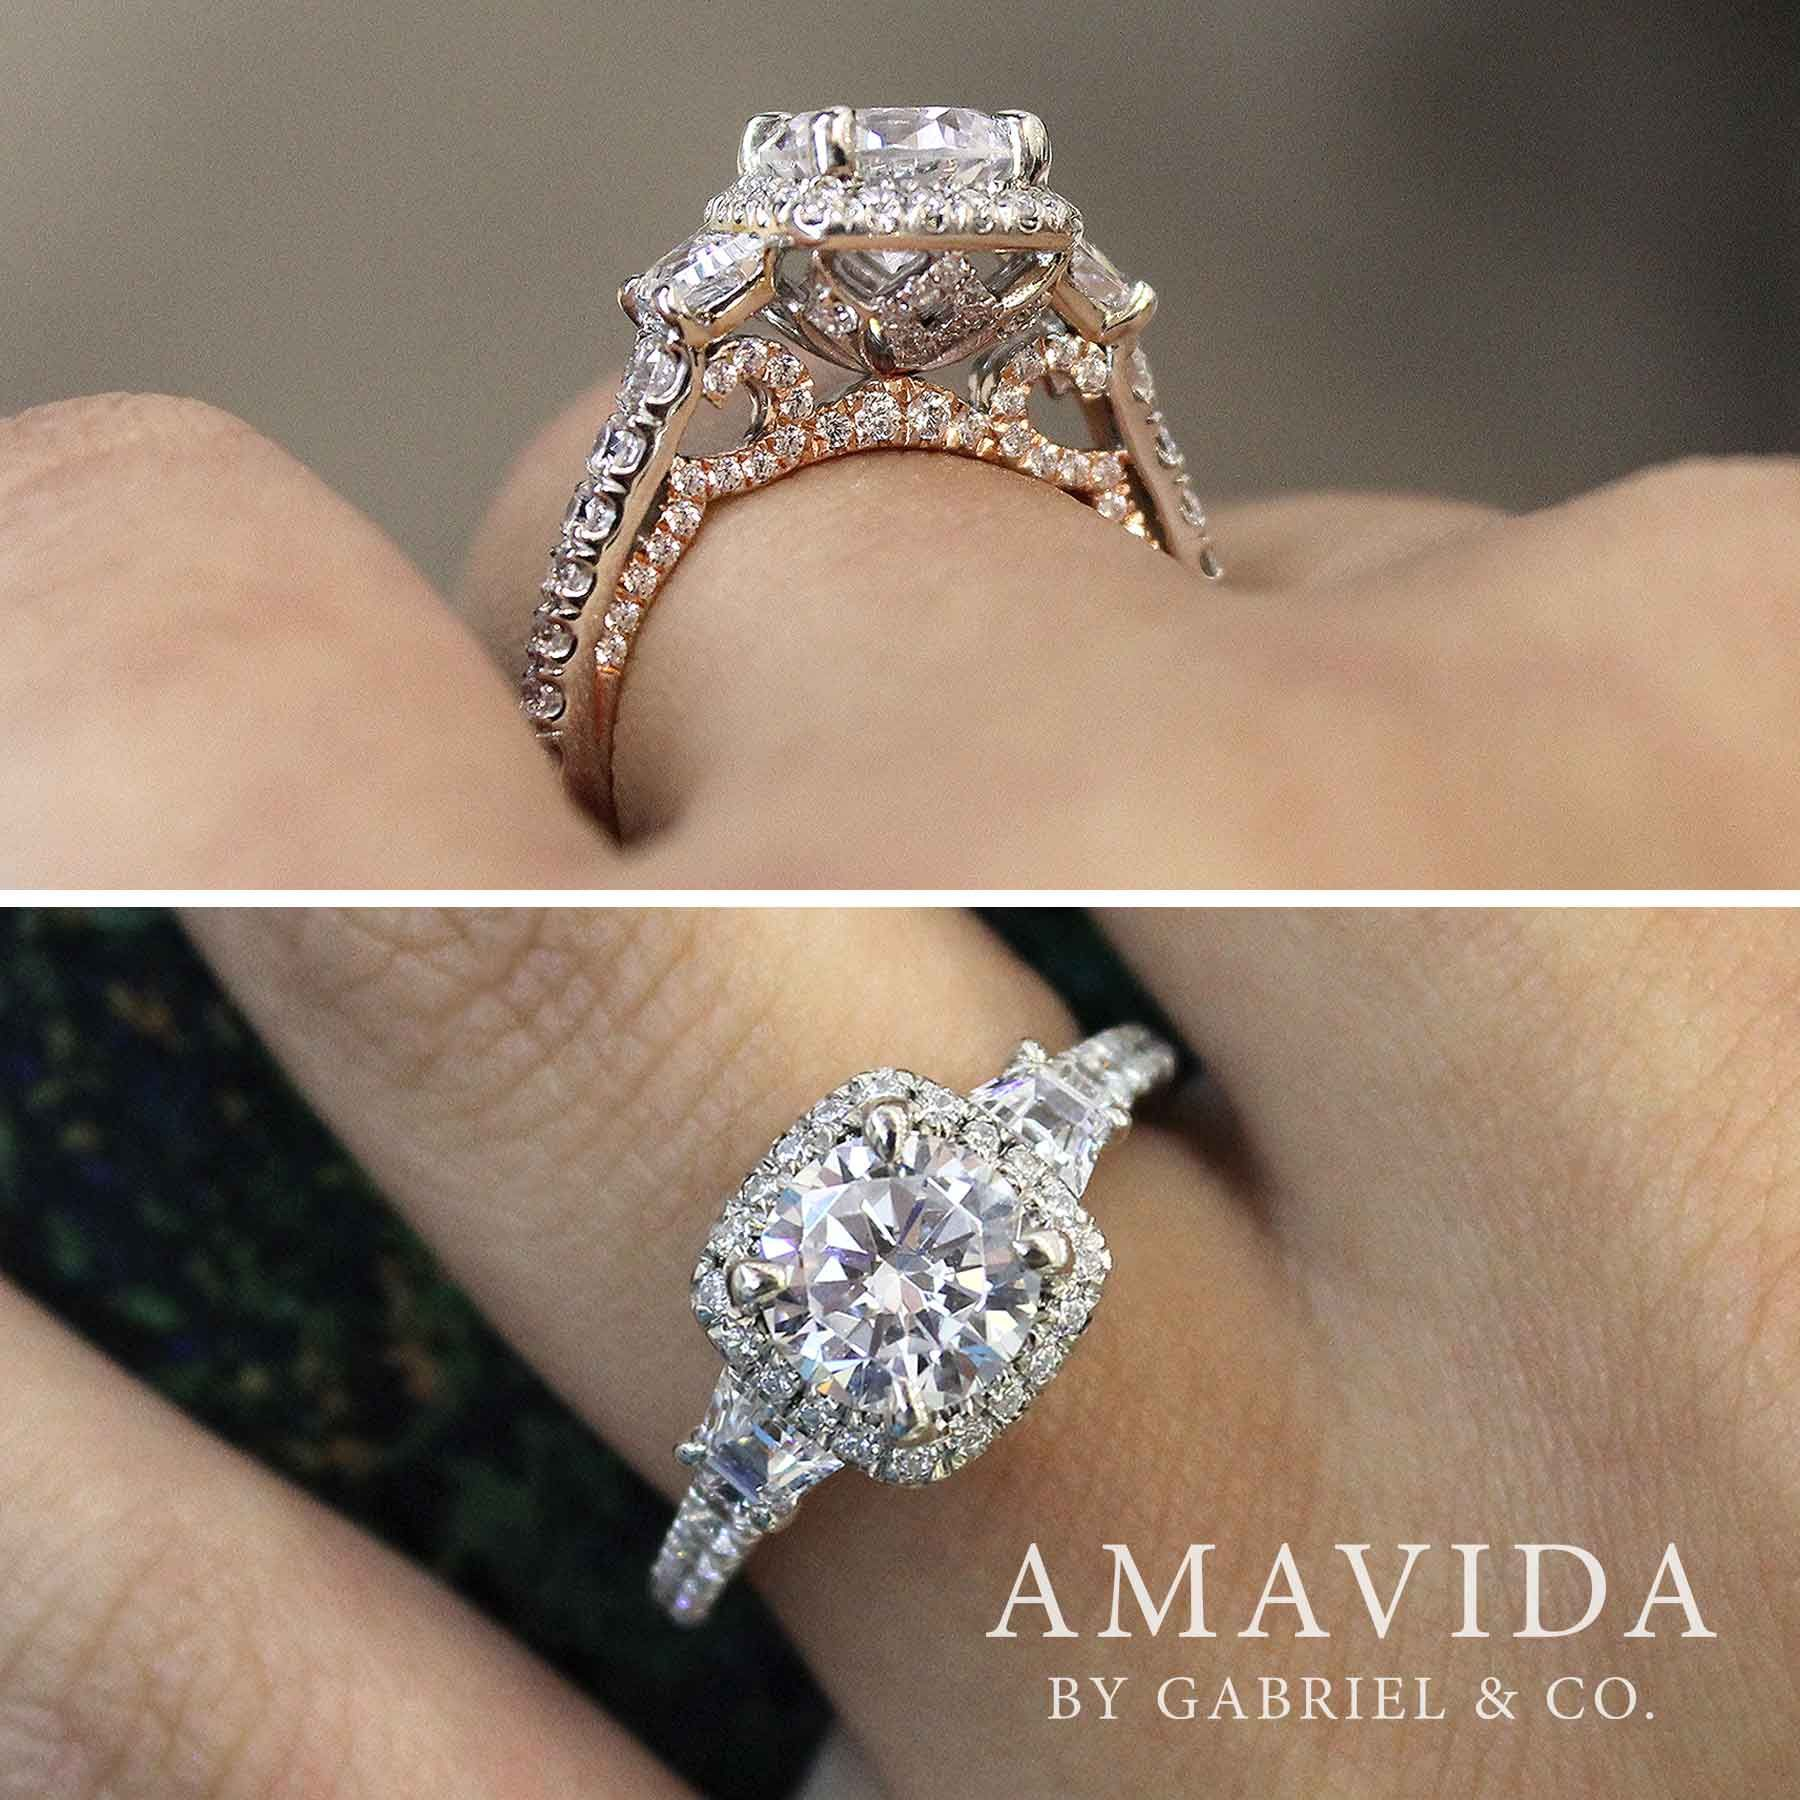 18k White Rose Gold Cushion Three Stone Halo Round Diamond Engagement Ring Er12872r6t83jj Wedding Rings Unique Wedding Rings Engagement Expensive Engagement Rings